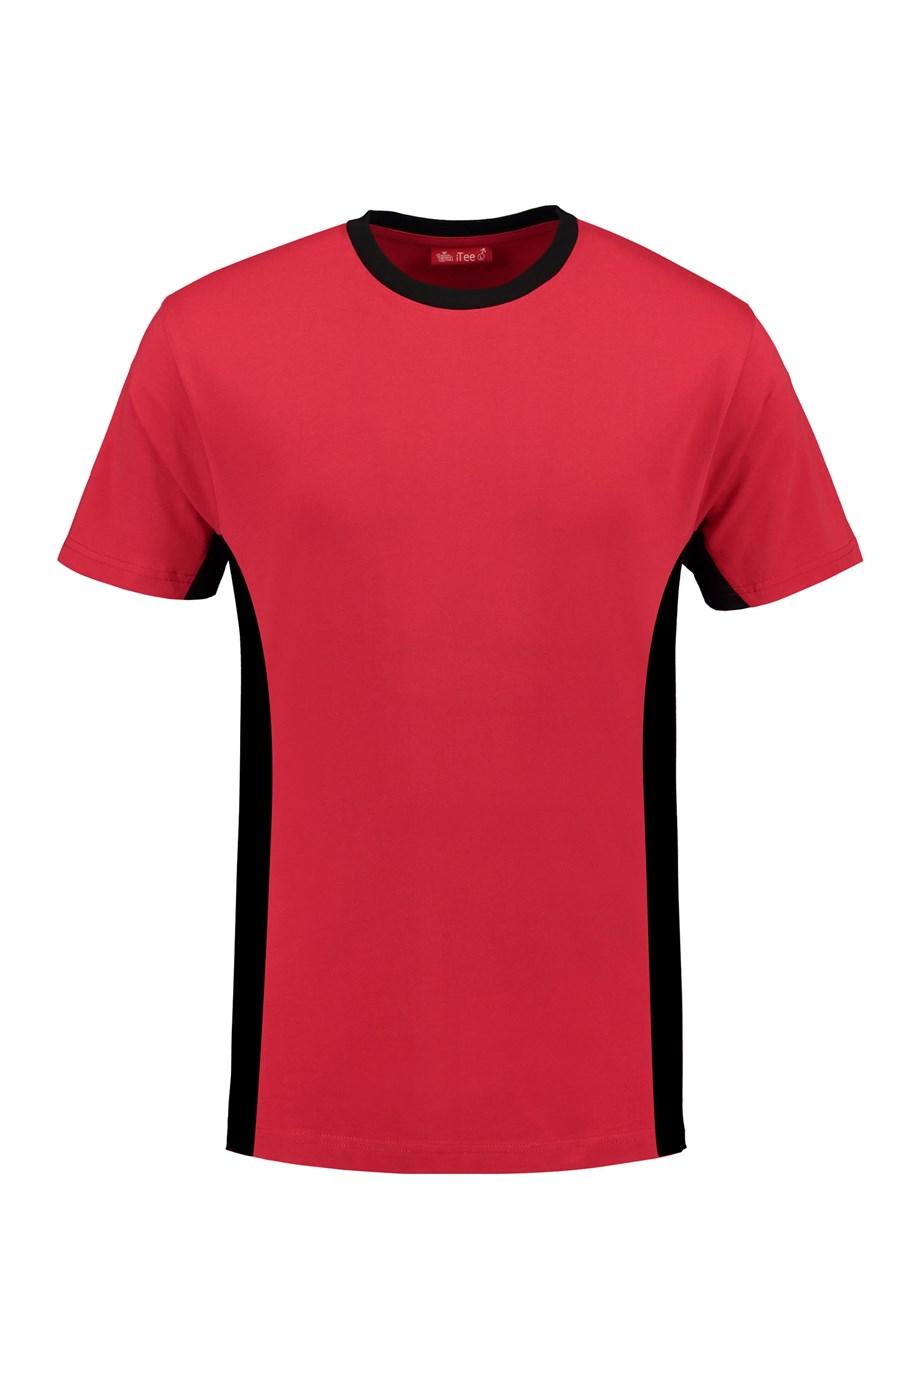 red - black